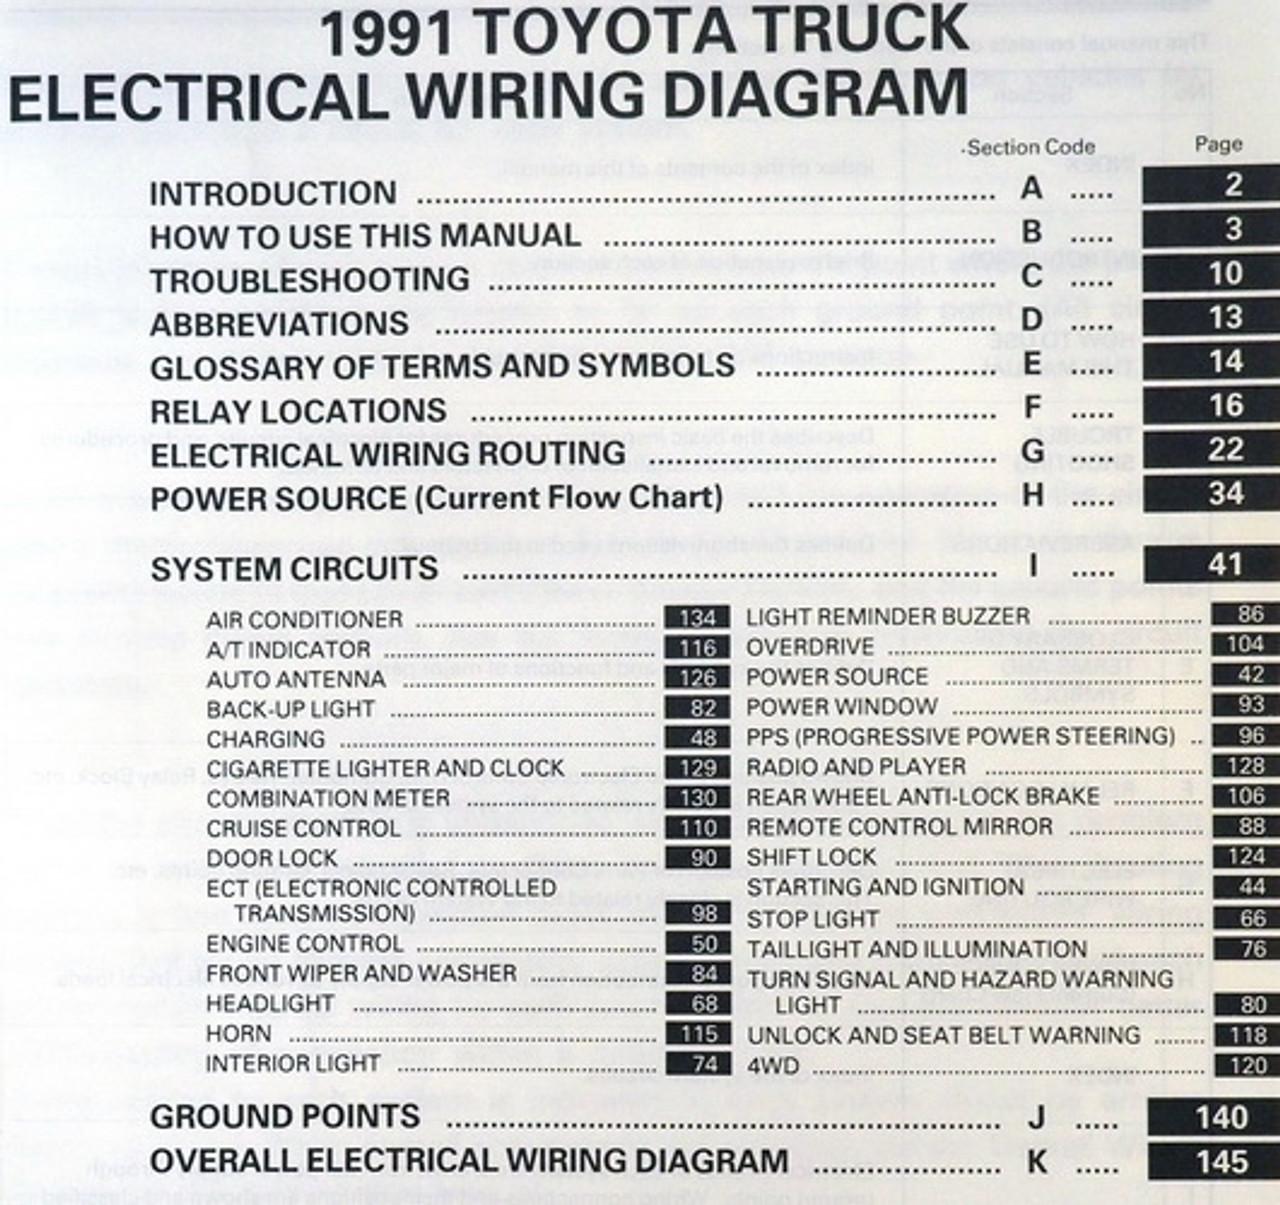 1991 4runner wiring schematic -house phone line wiring diagram | new book wiring  diagram  new book wiring diagram